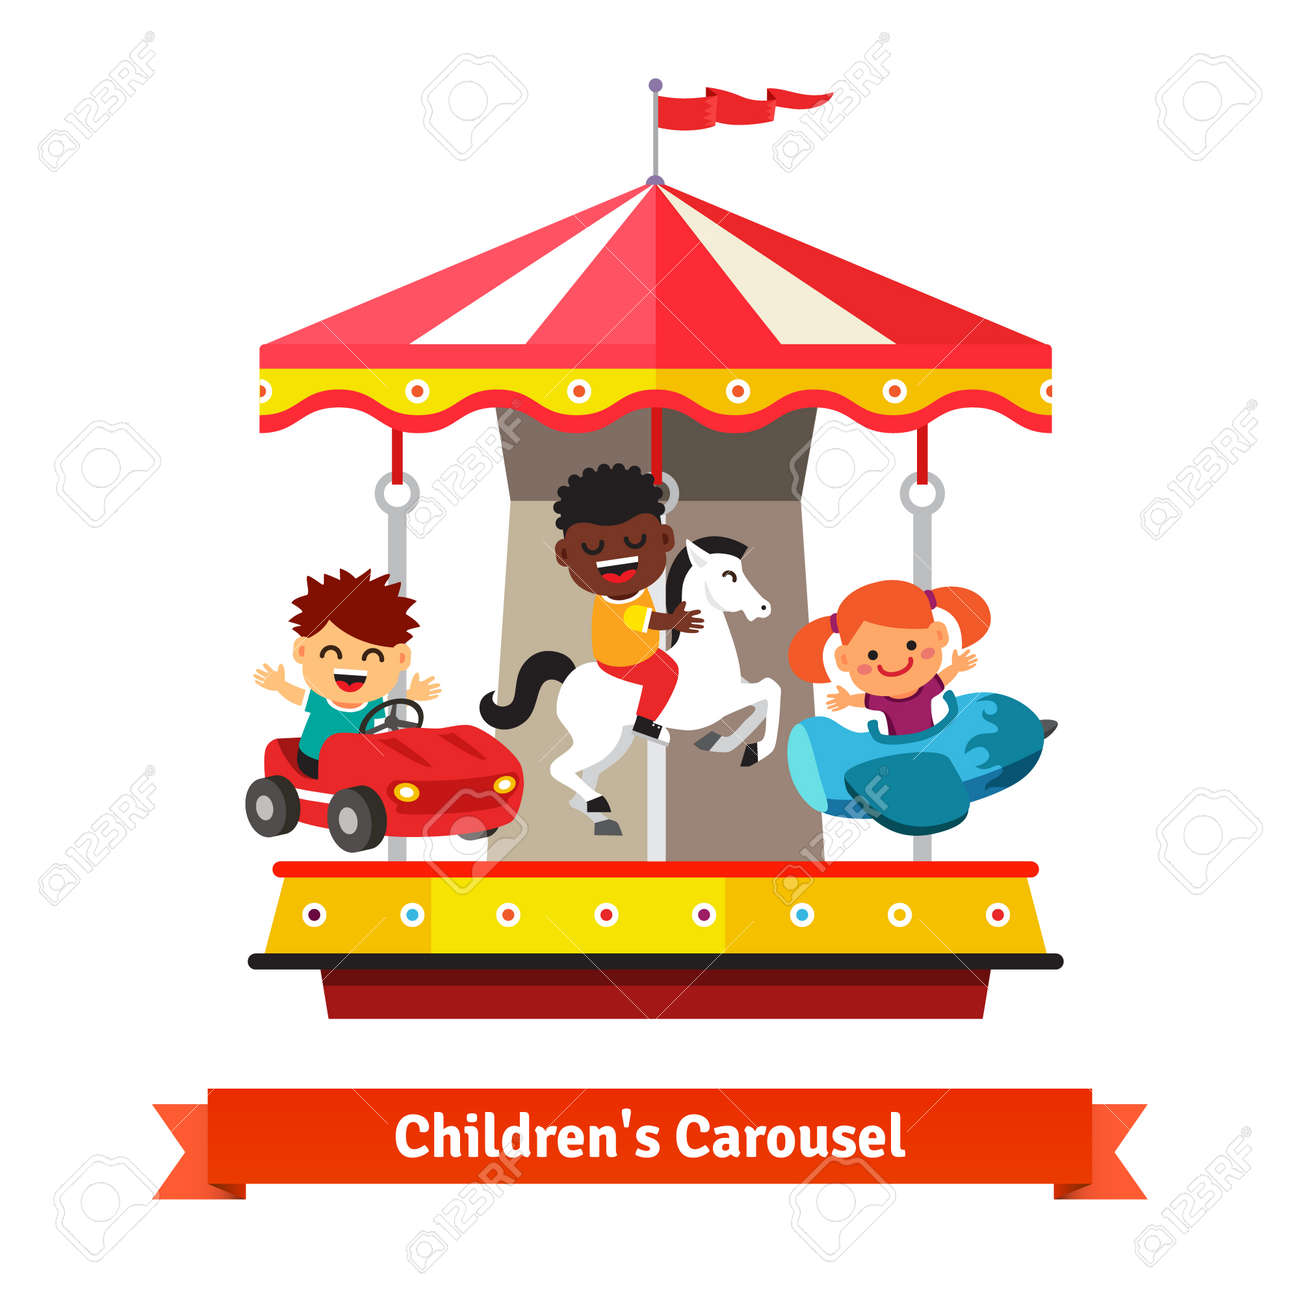 kids having fun on a carnival carousel boys and girl riding